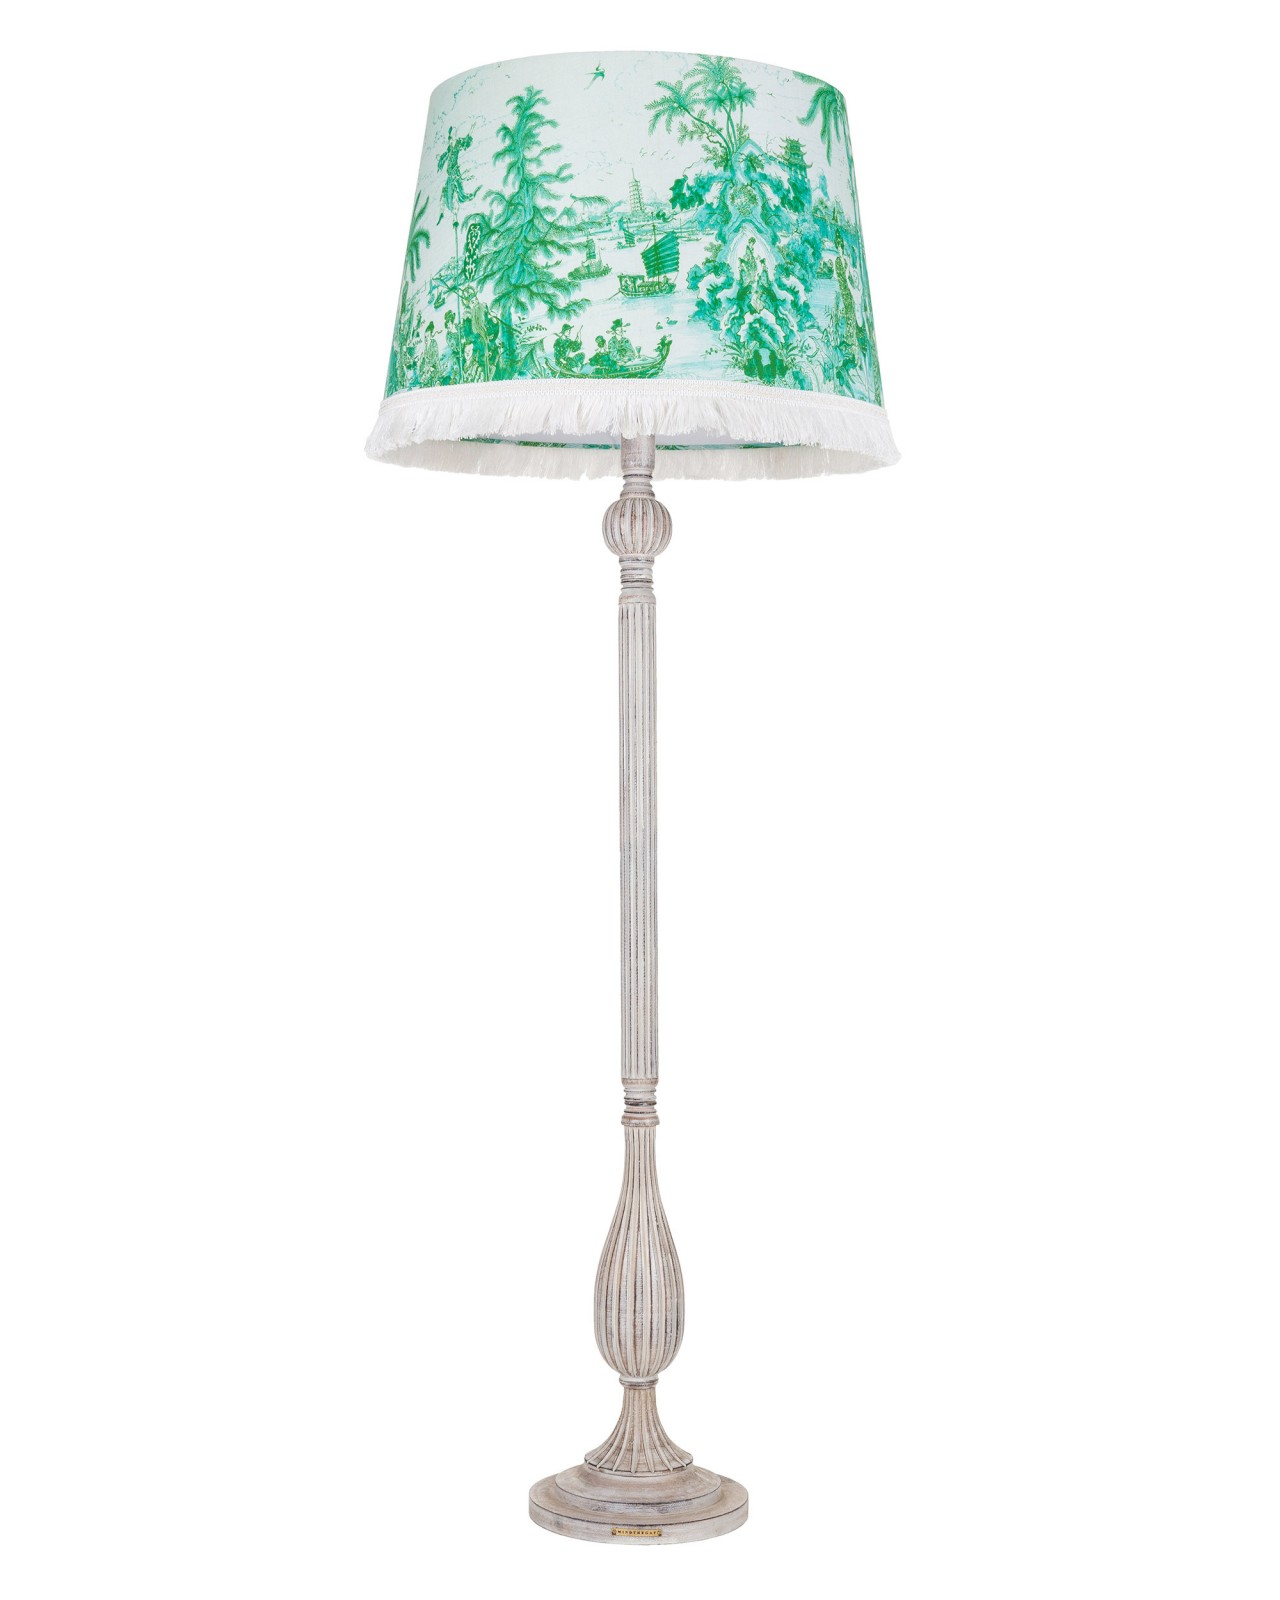 THE ISLAND ARTISAN Floor Lamp